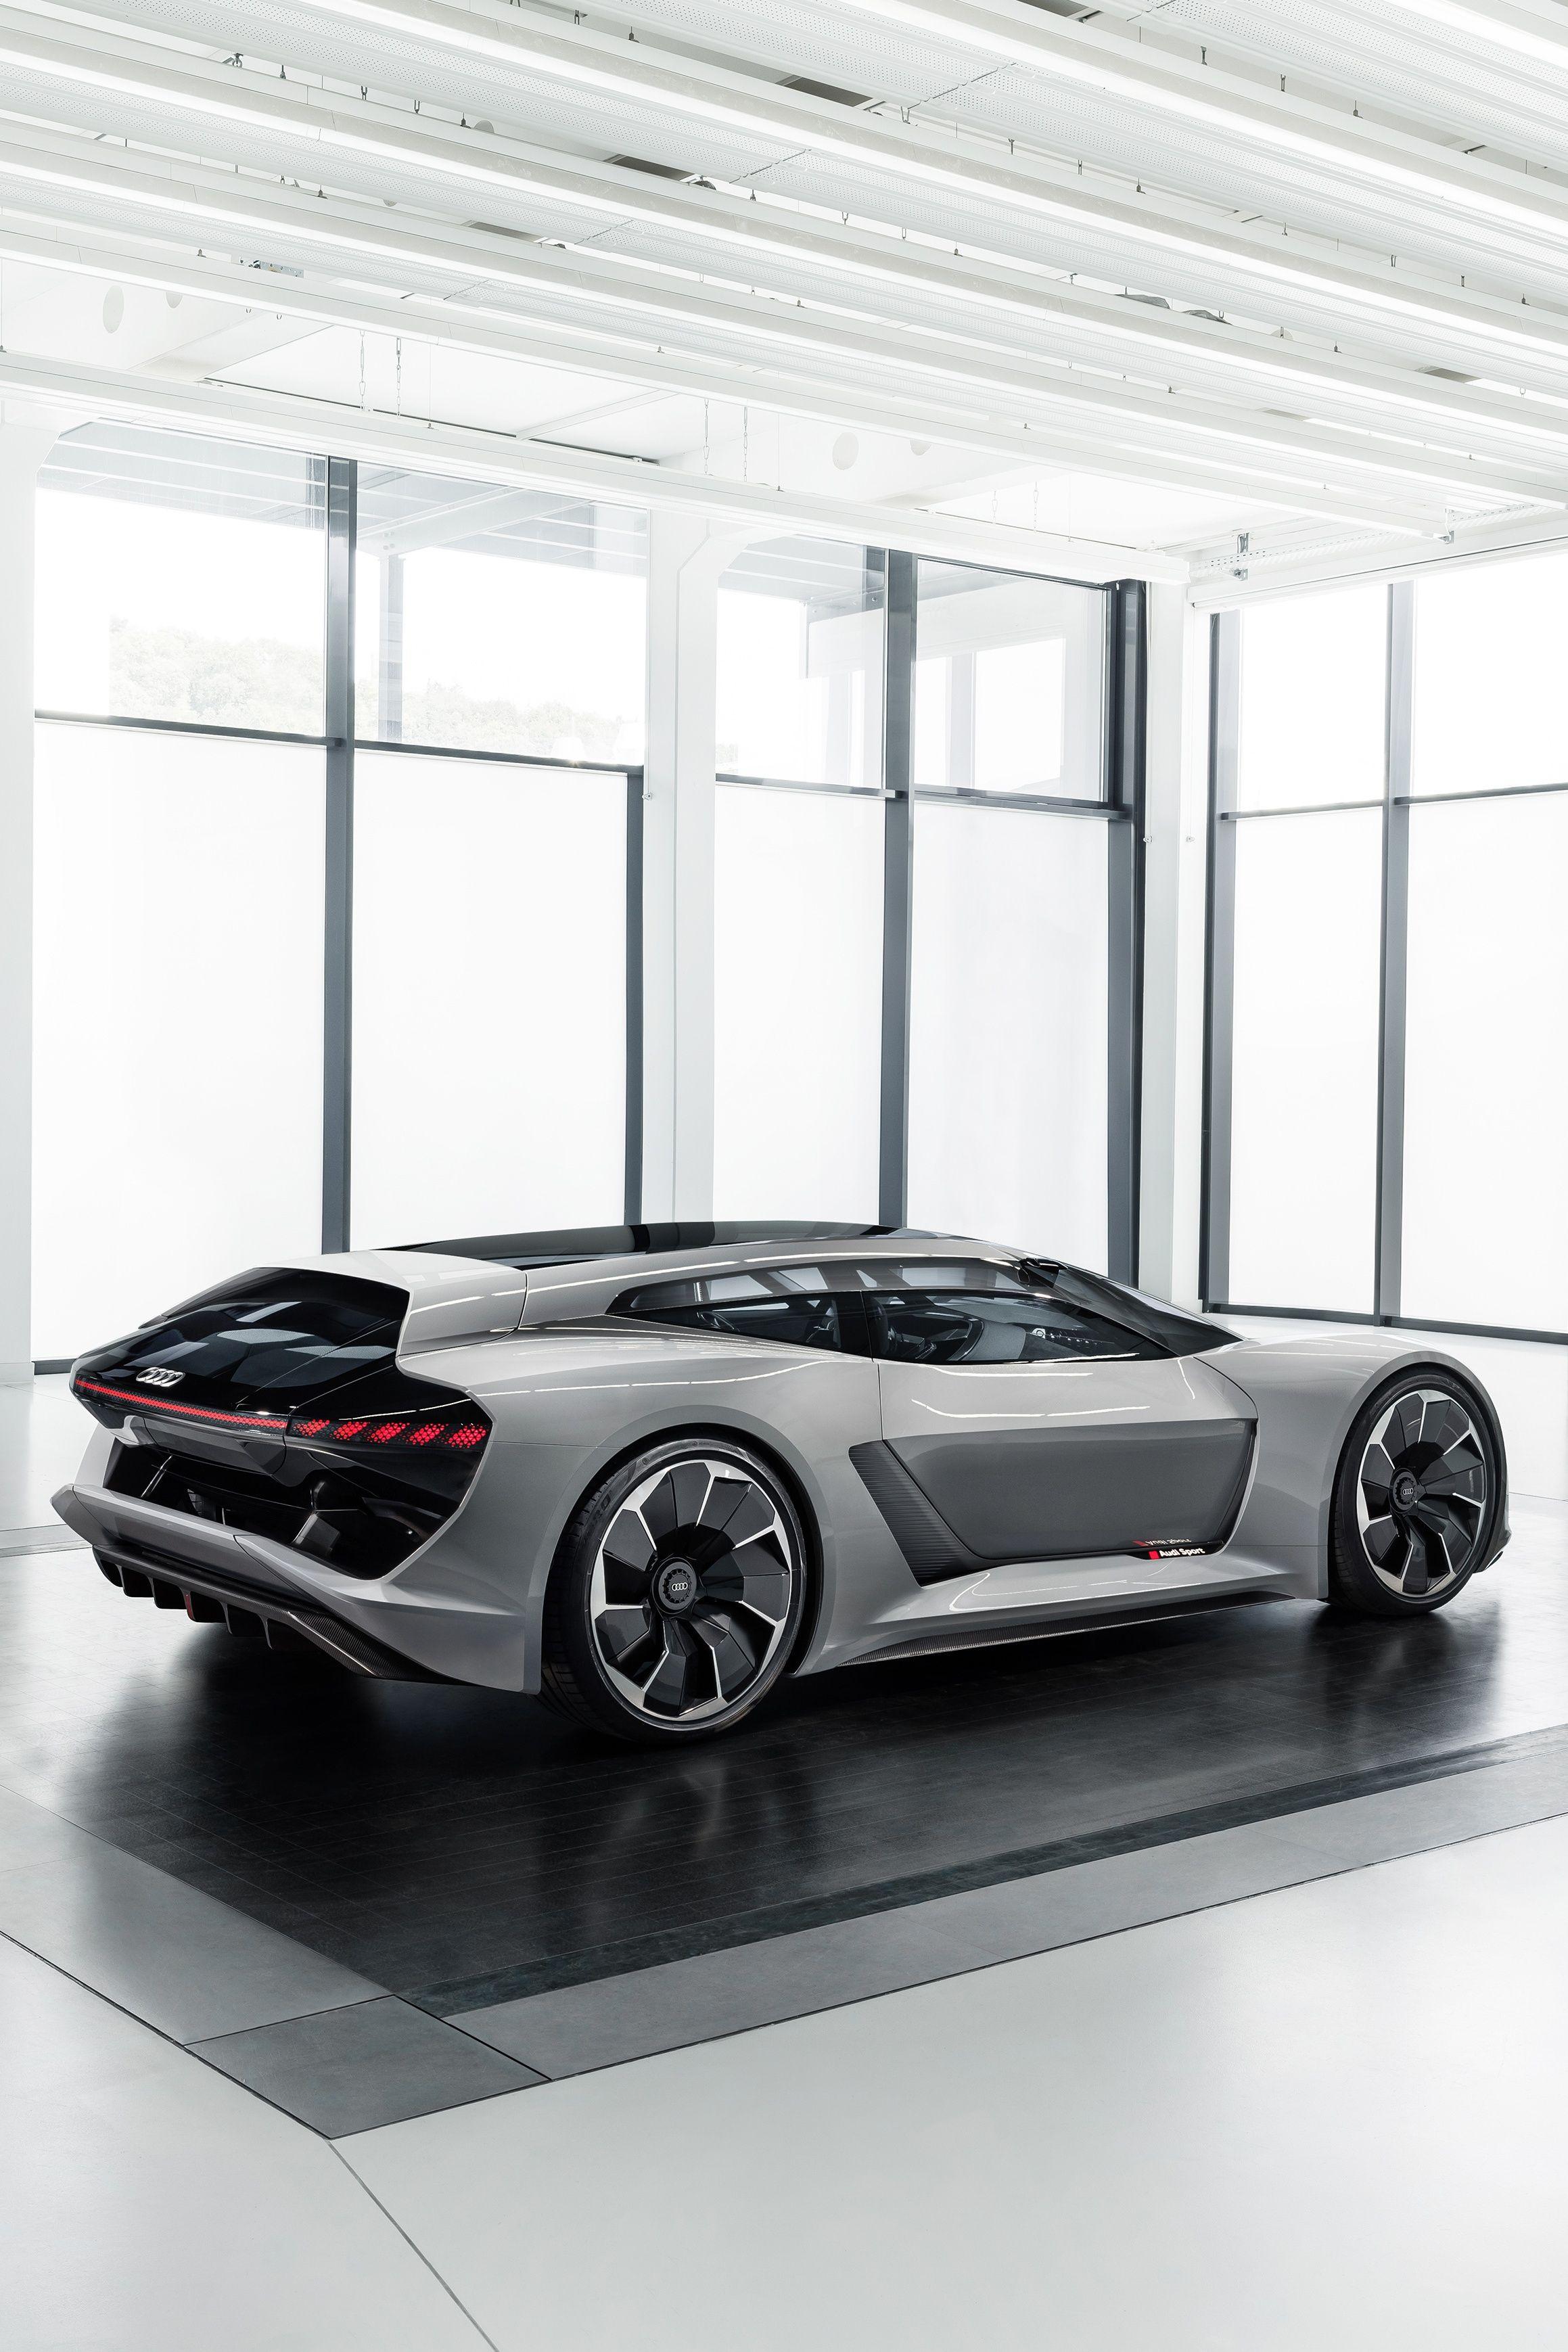 The All Electric Audi Pb18 E Tron The Man Audi Super Cars Supercars Concept